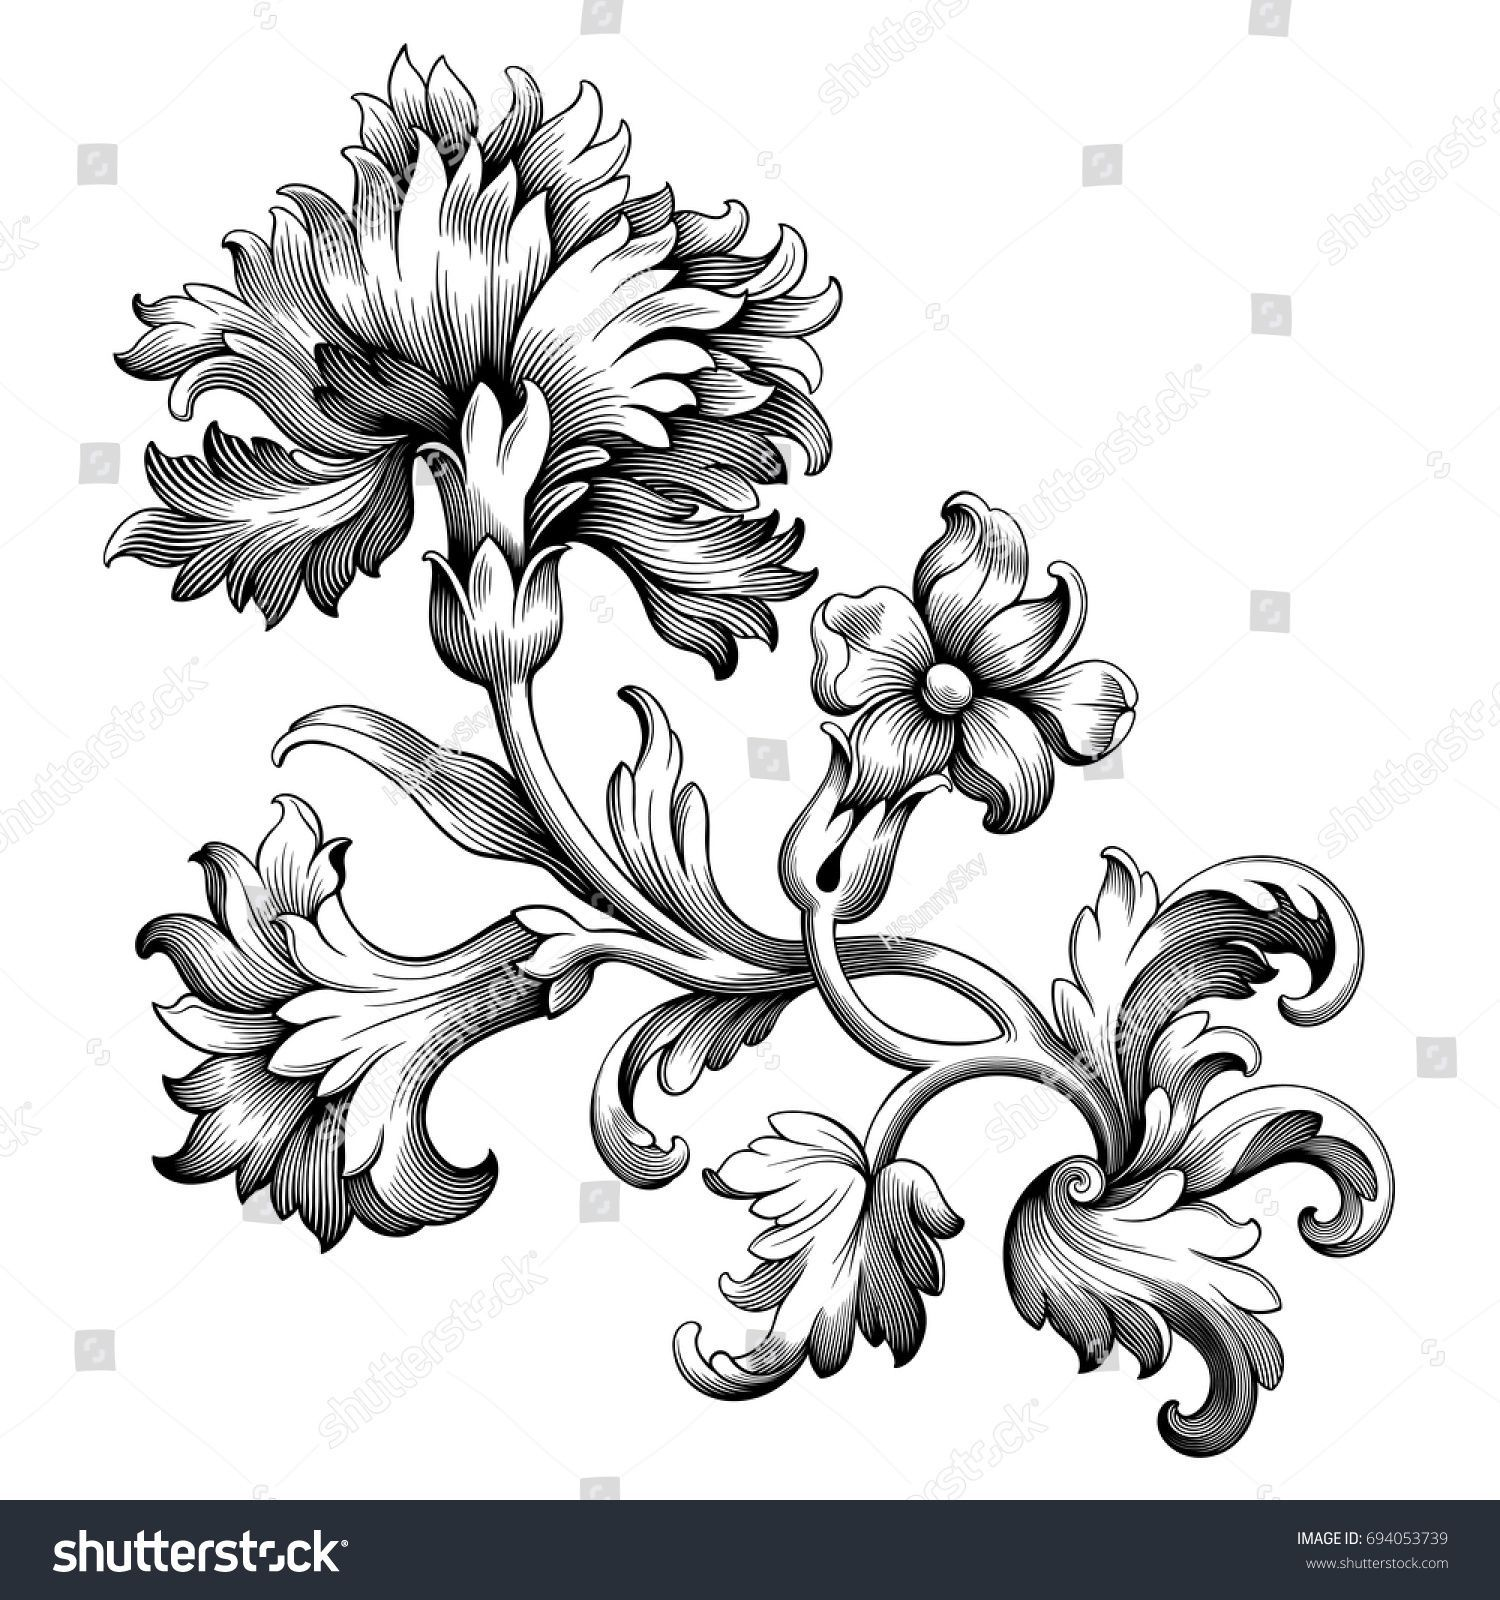 Rose Peony Carnation Flower Vintage Baroque Victorian Frame Border Floral Ornament Leaf Scroll Engraved Retro In 2020 Victorian Frame Vintage Flowers Ornament Drawing